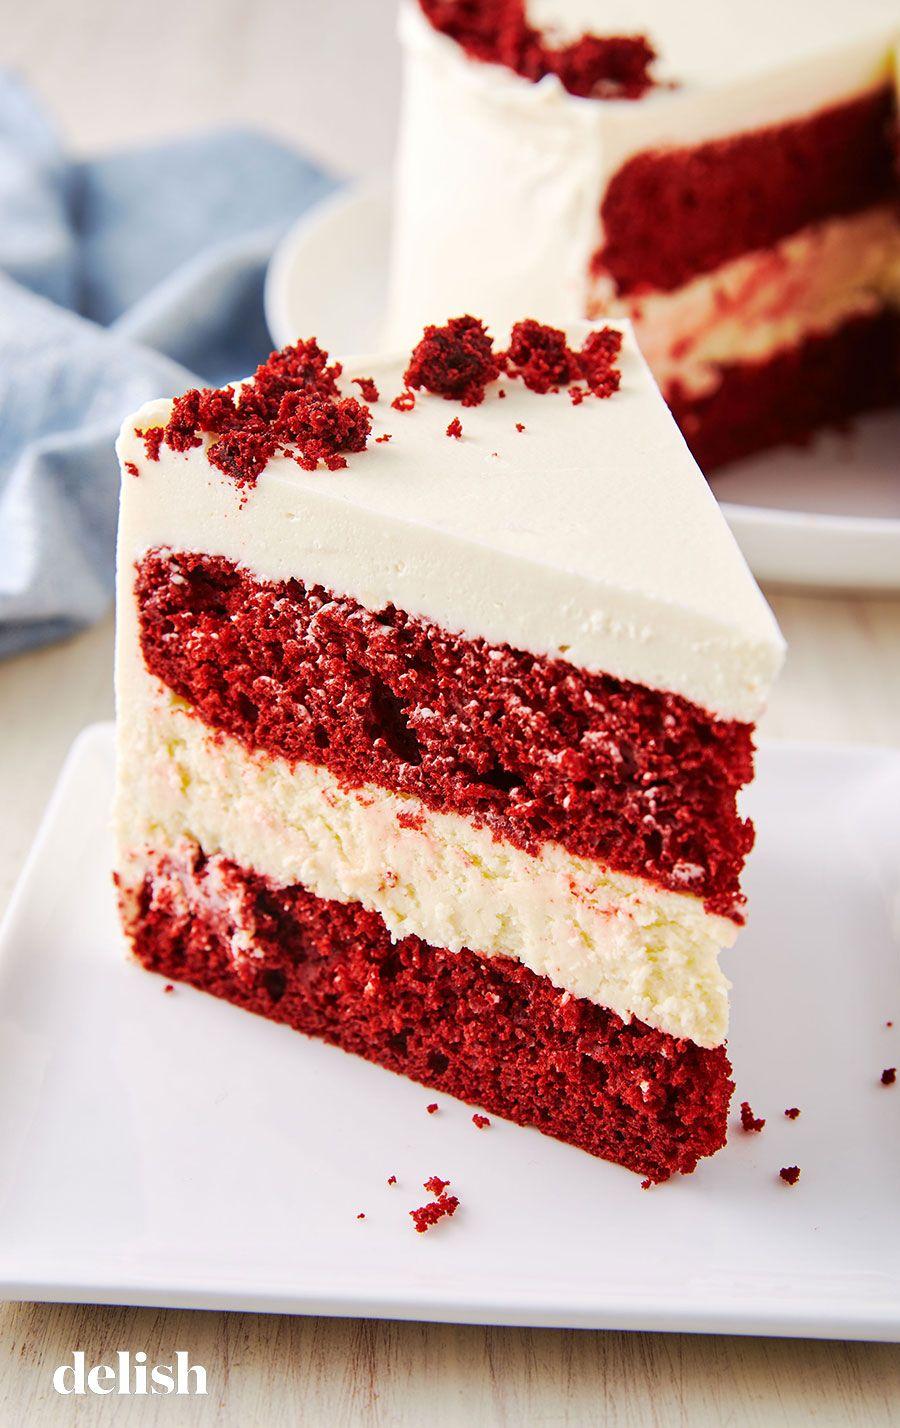 Red Velvet Cheesecake Cake Is The Ultimate Christmas Dessert Recipe Cheesecake Cake Recipes Velvet Cake Recipes Red Velvet Cake Recipe